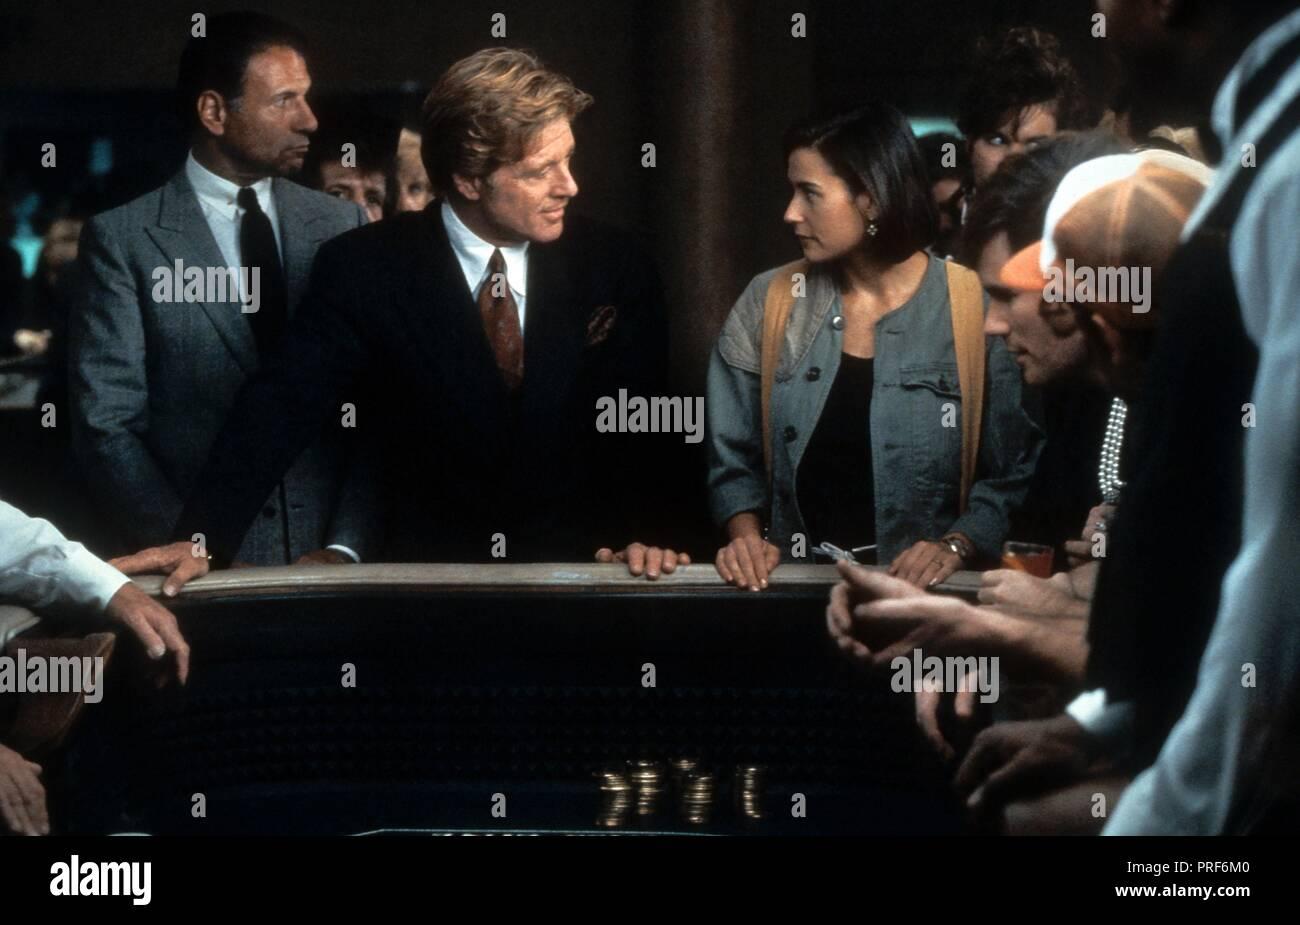 Original film title: INDECENT PROPOSAL. English title: INDECENT PROPOSAL. Year: 1993. Director: ADRIAN LYNE. Stars: DEMI MOORE; ROBERT REDFORD. Credit: PARAMOUNT PICTURES / Album - Stock Image